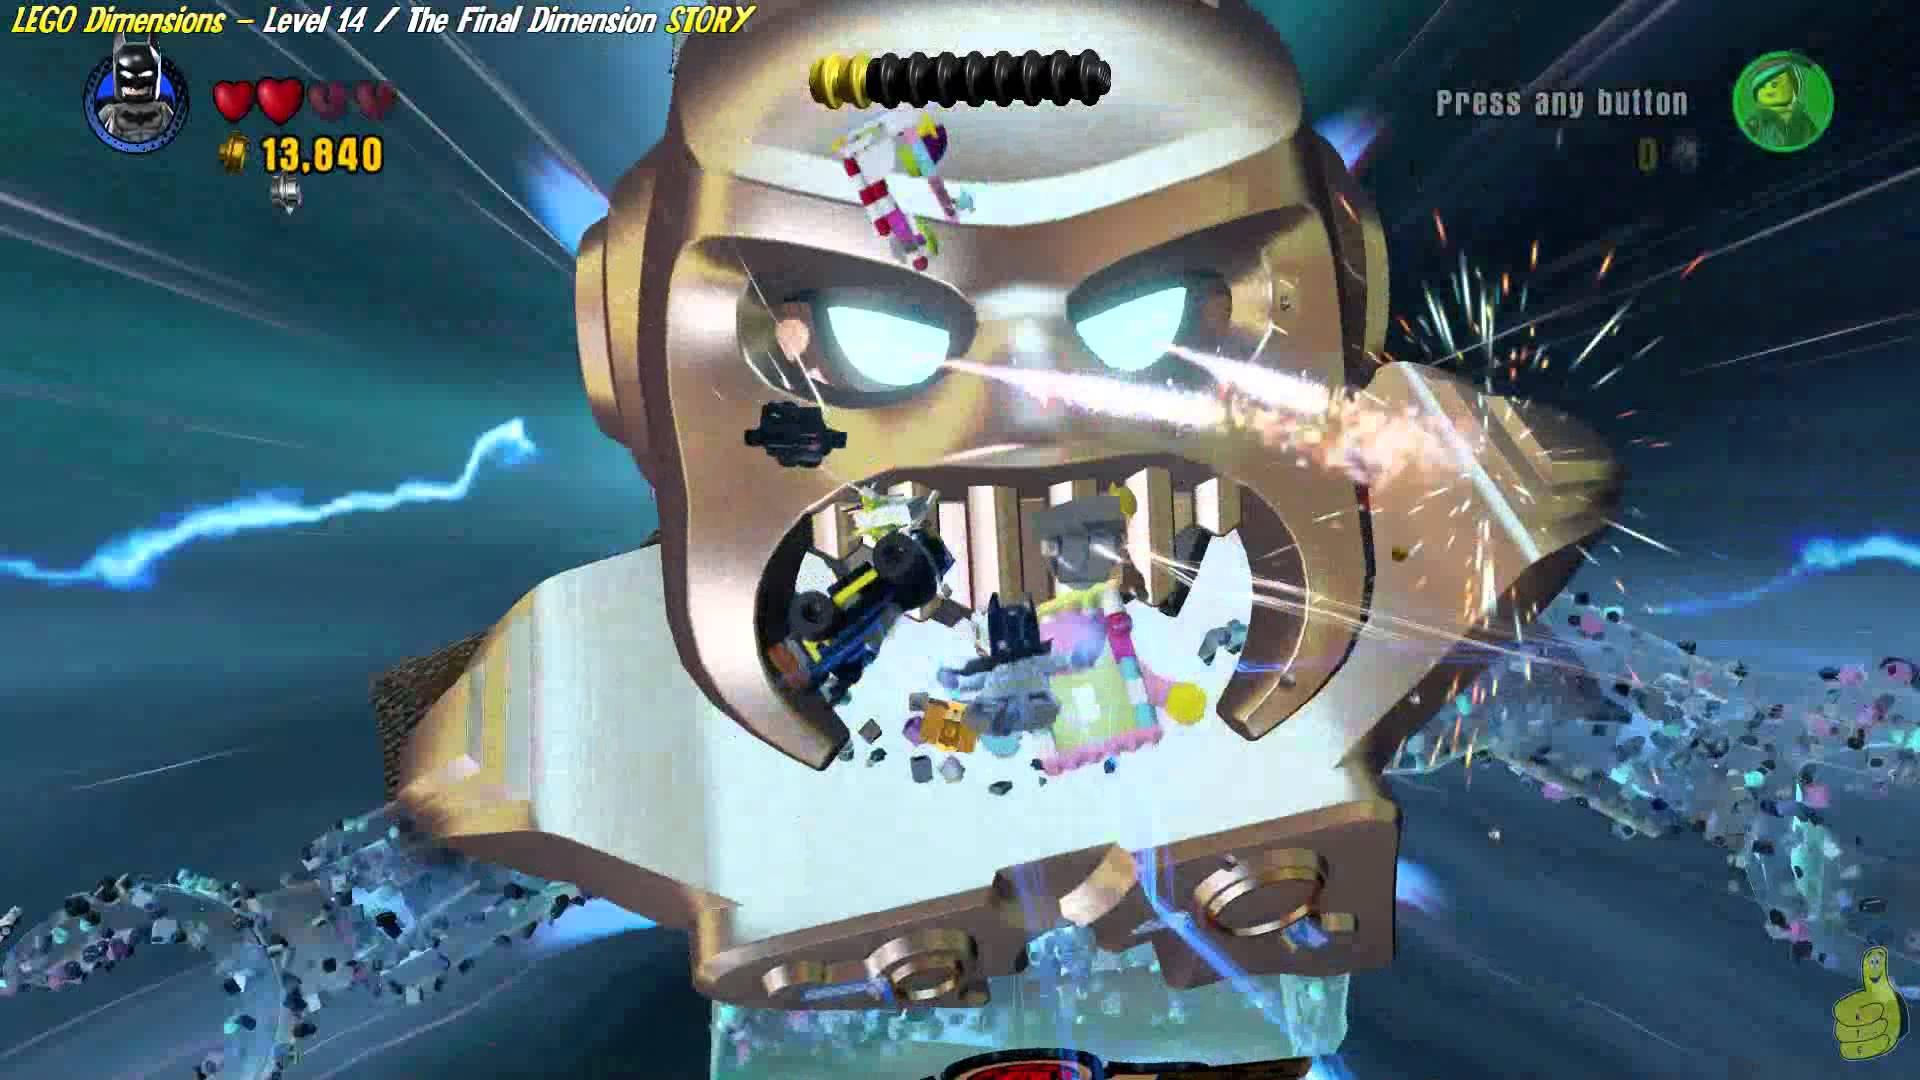 Lego Dimensions: Lvl 14 The Final Dimension STORY/A Serious Loophole Trophy/Achievement – HTG